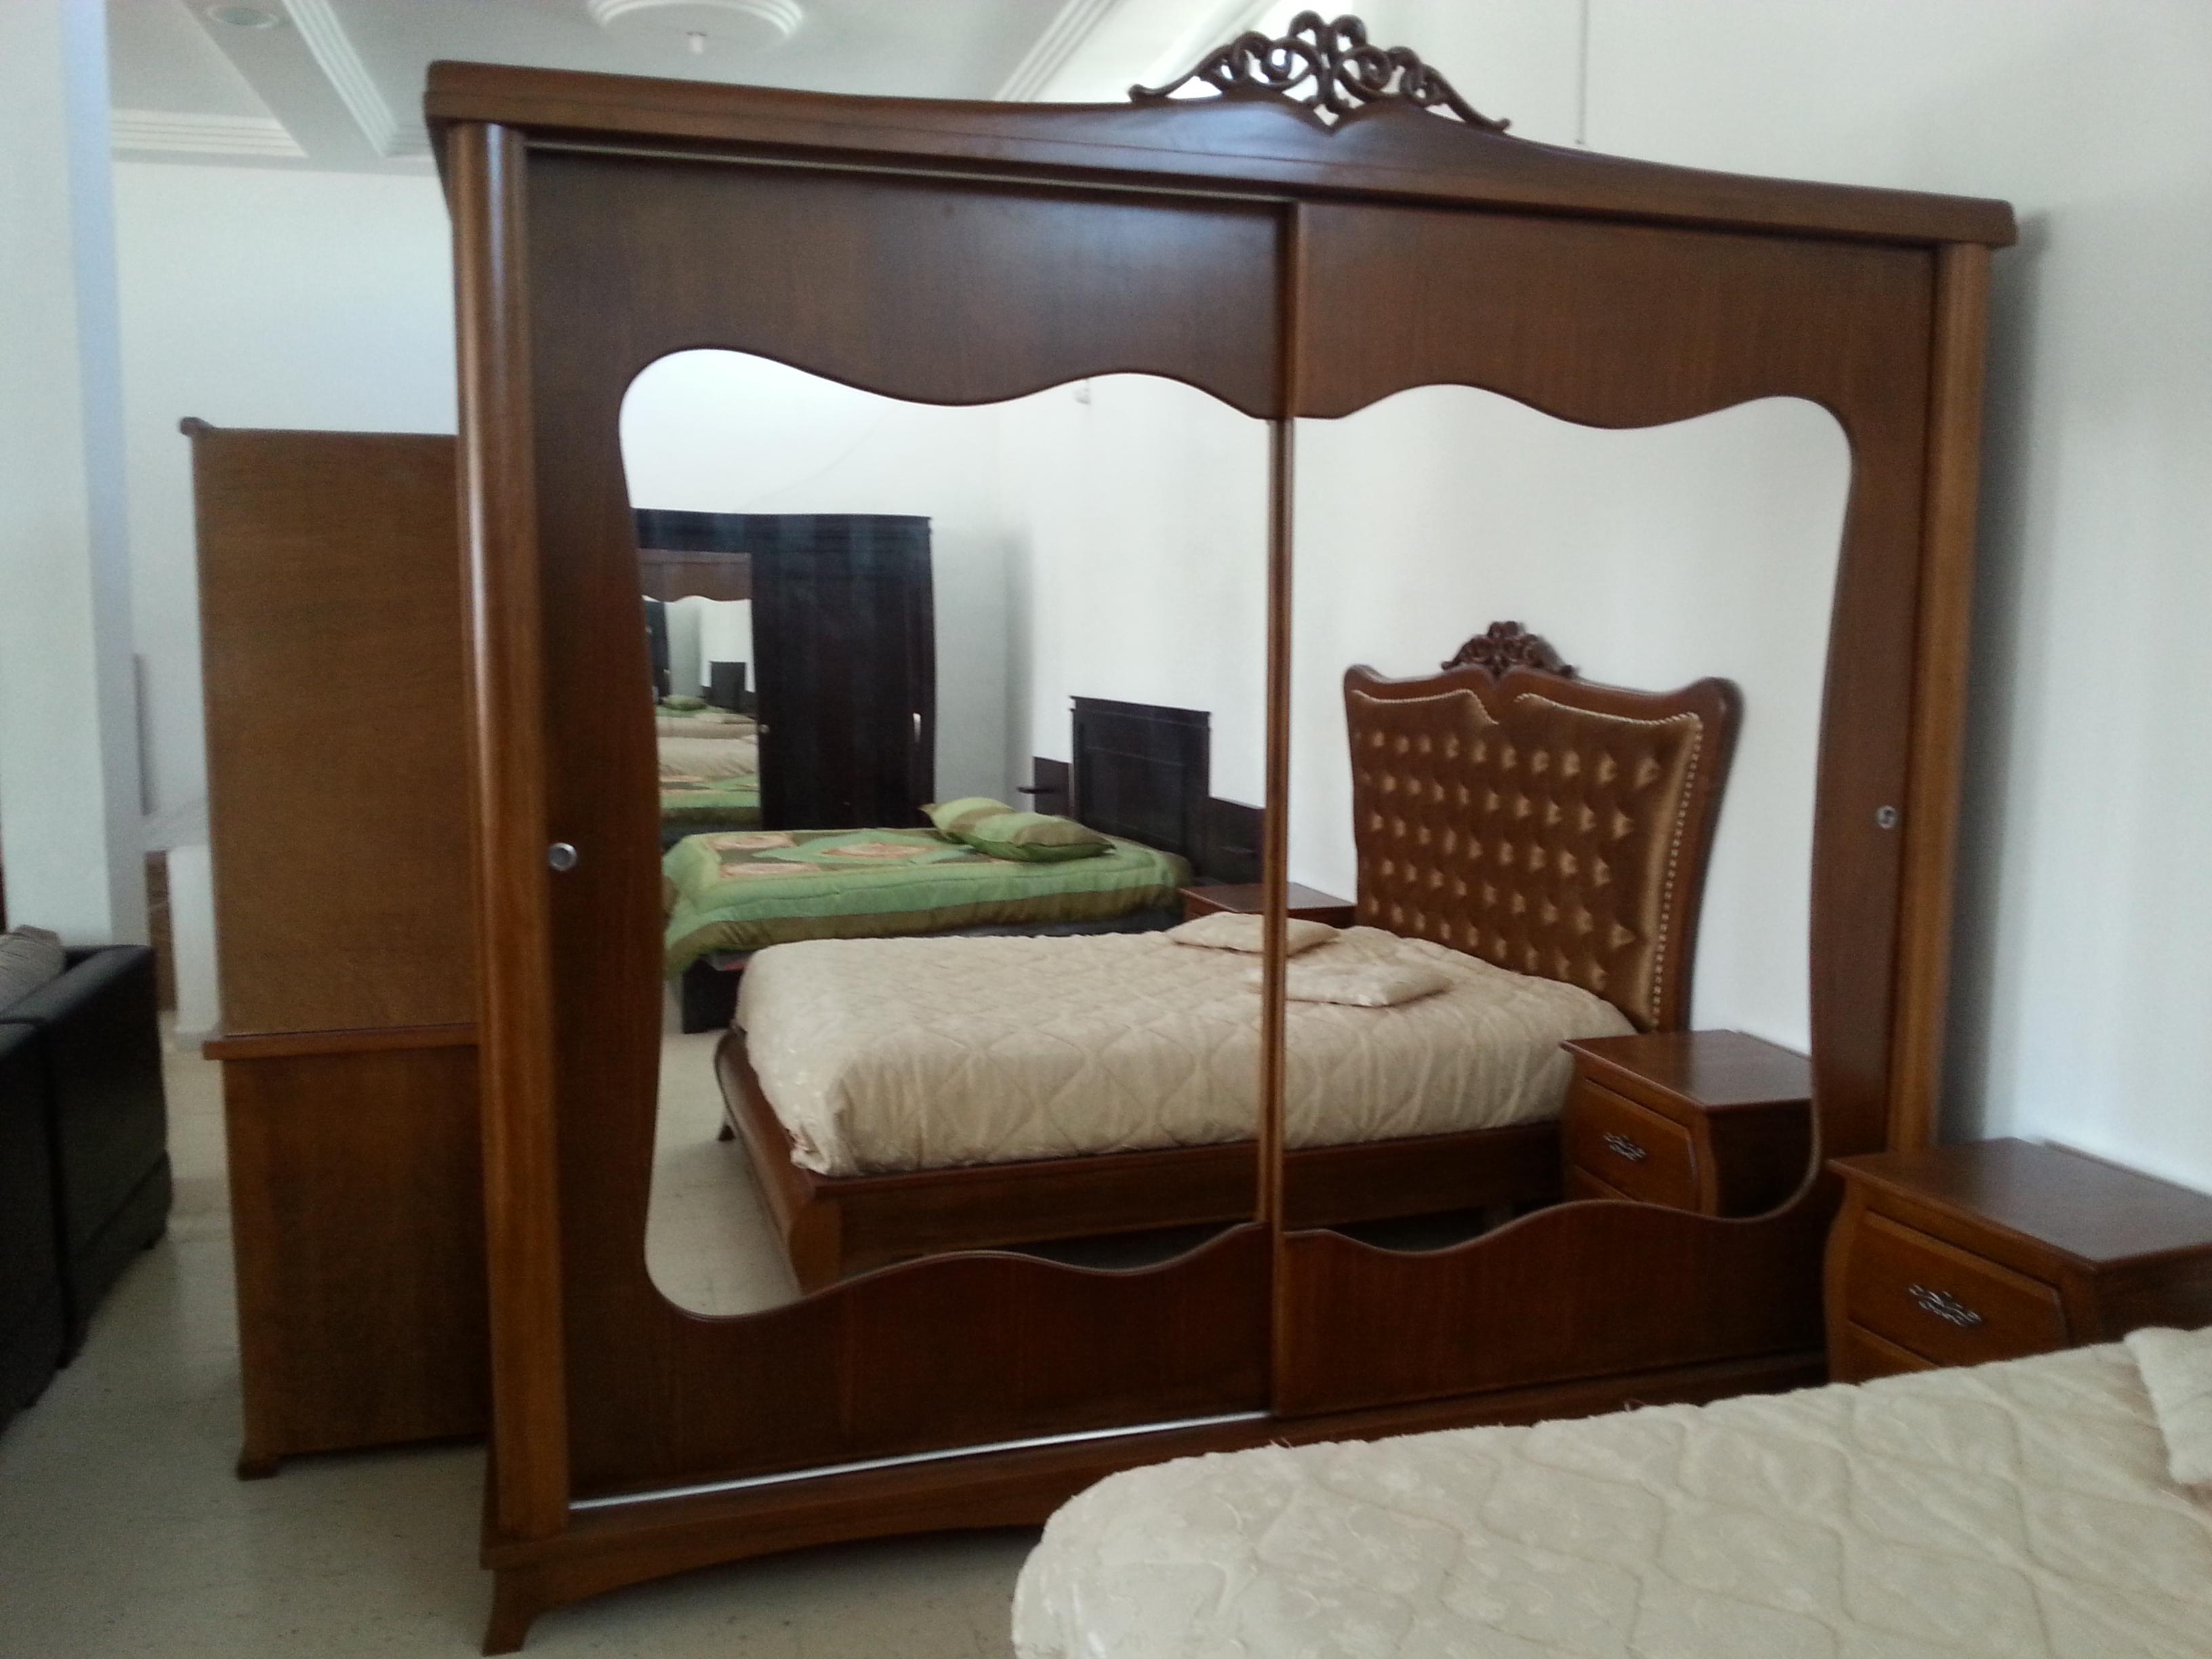 Tej meubles et d coration tunisie for Meuble tv zebra